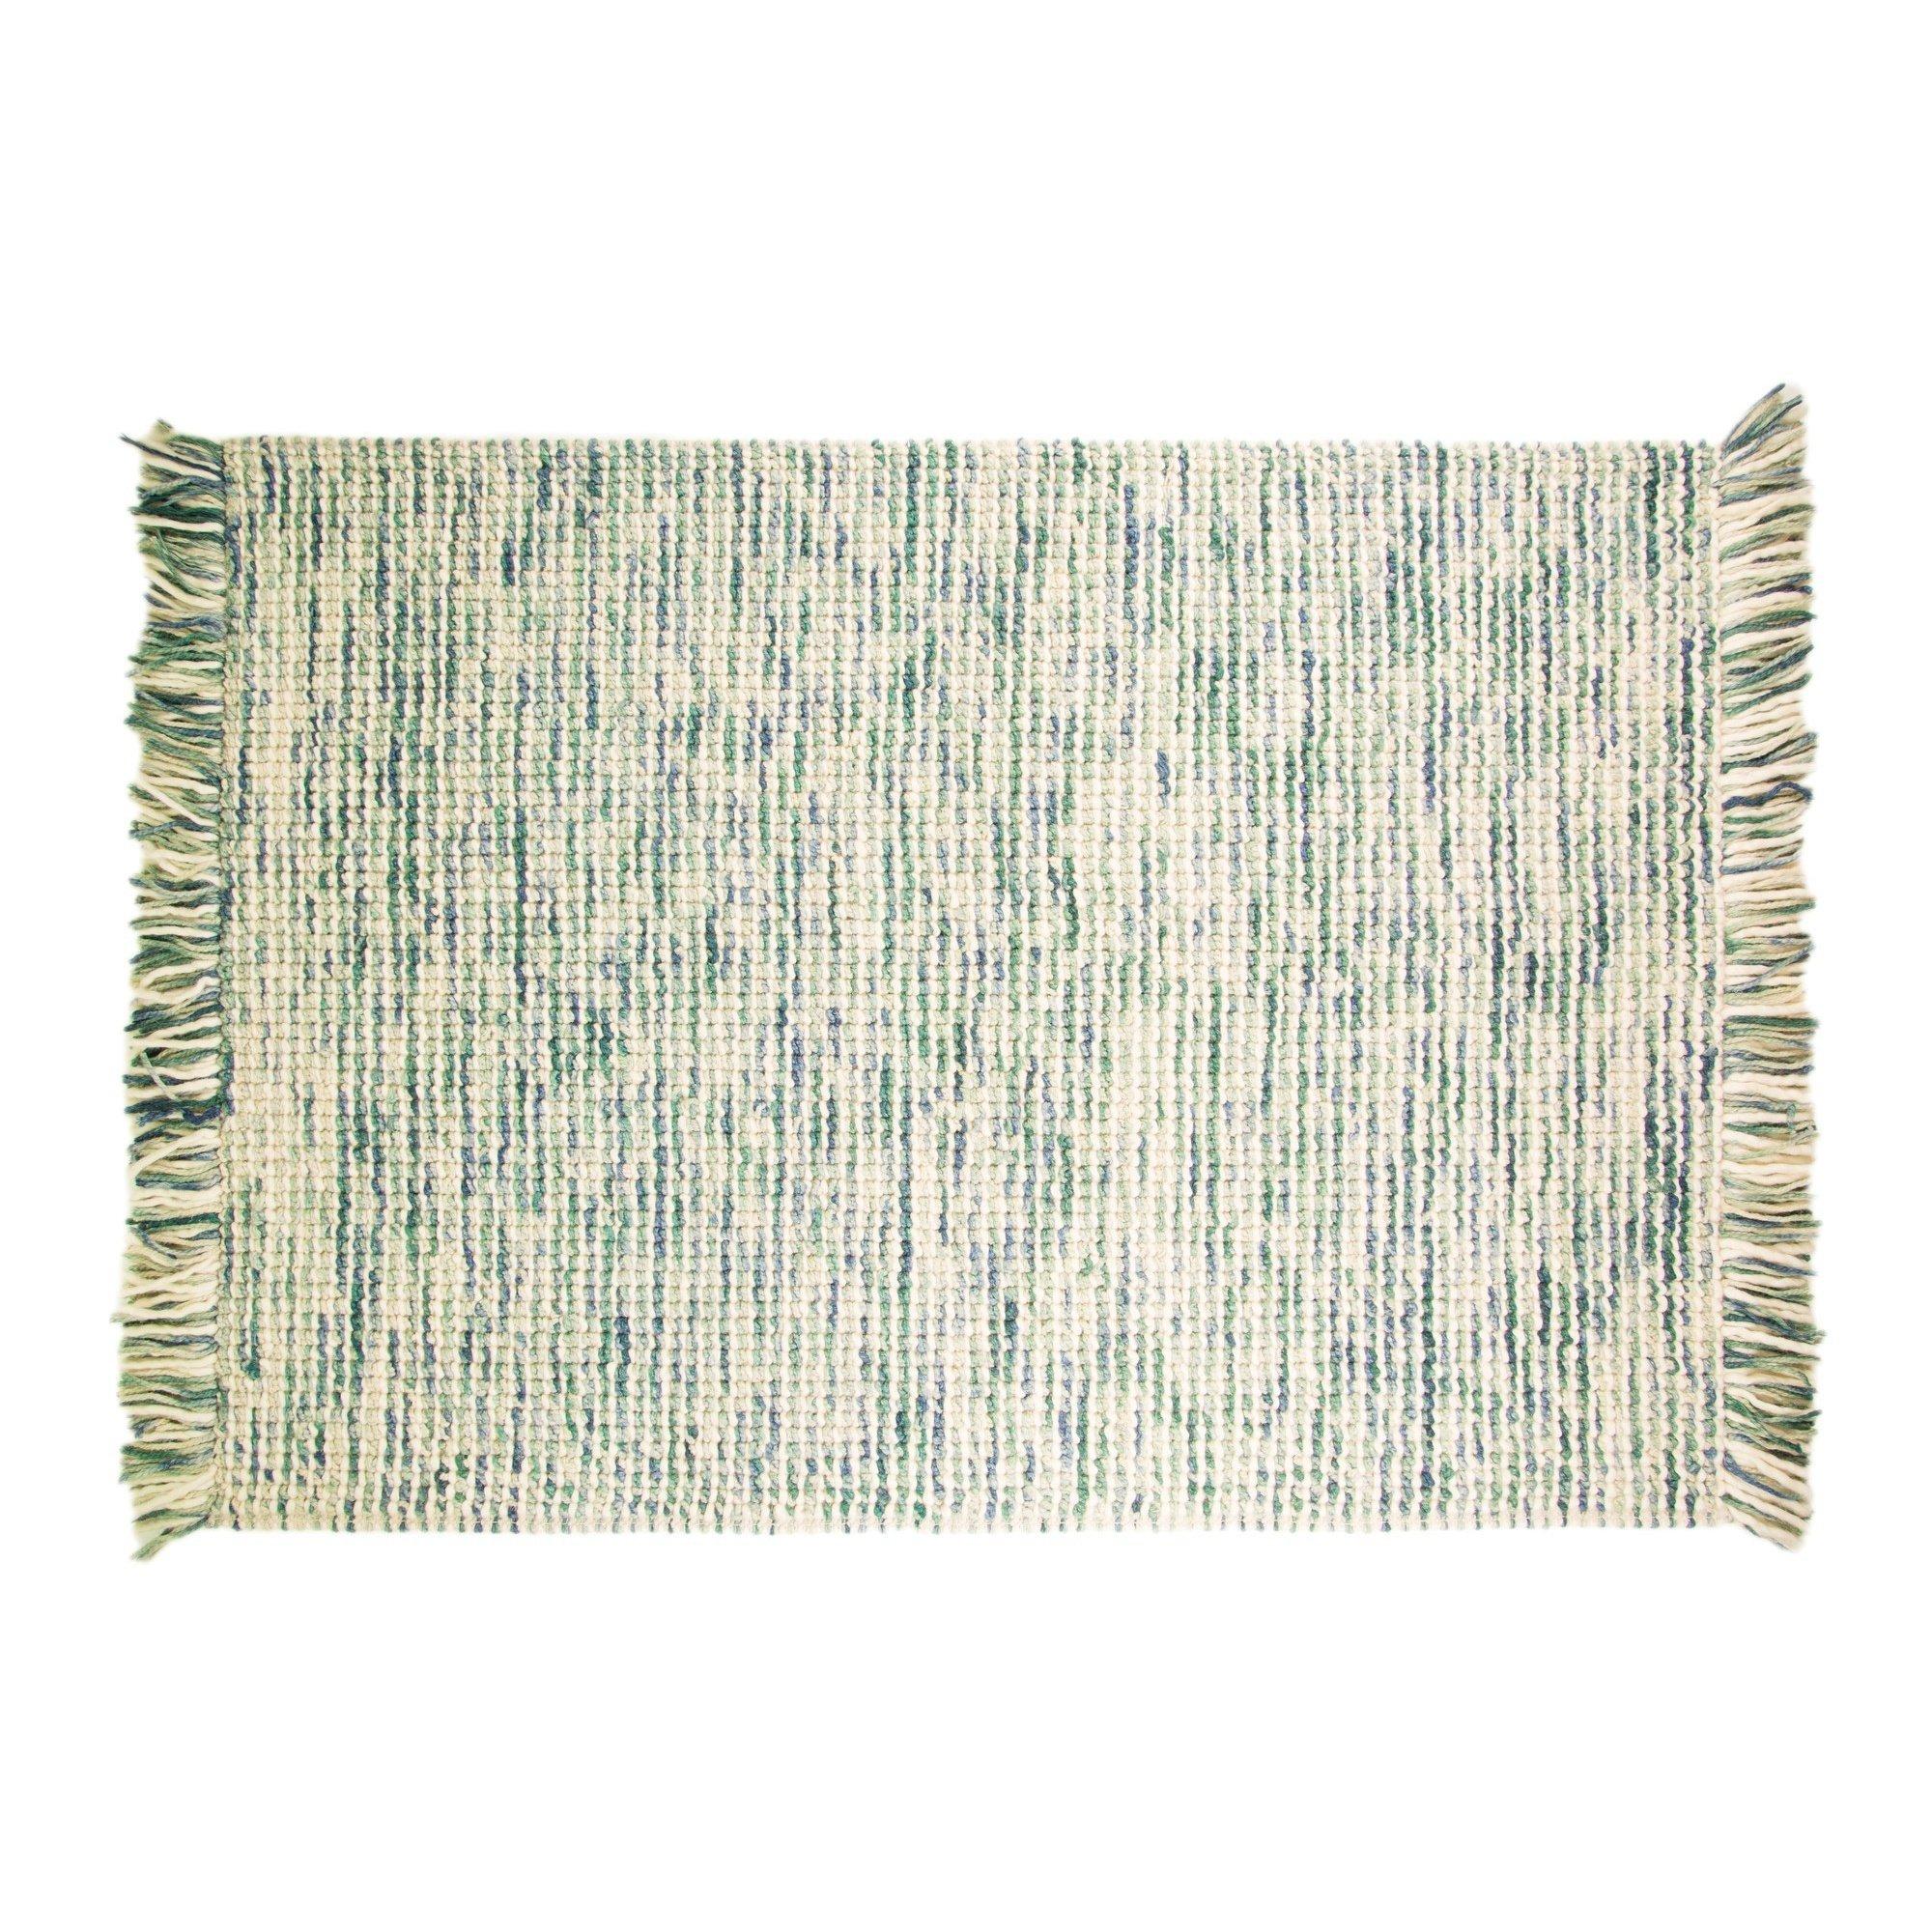 Flair Rugs Alfombra, Lana, 80 cm x 150 cm: Amazon.es: Hogar